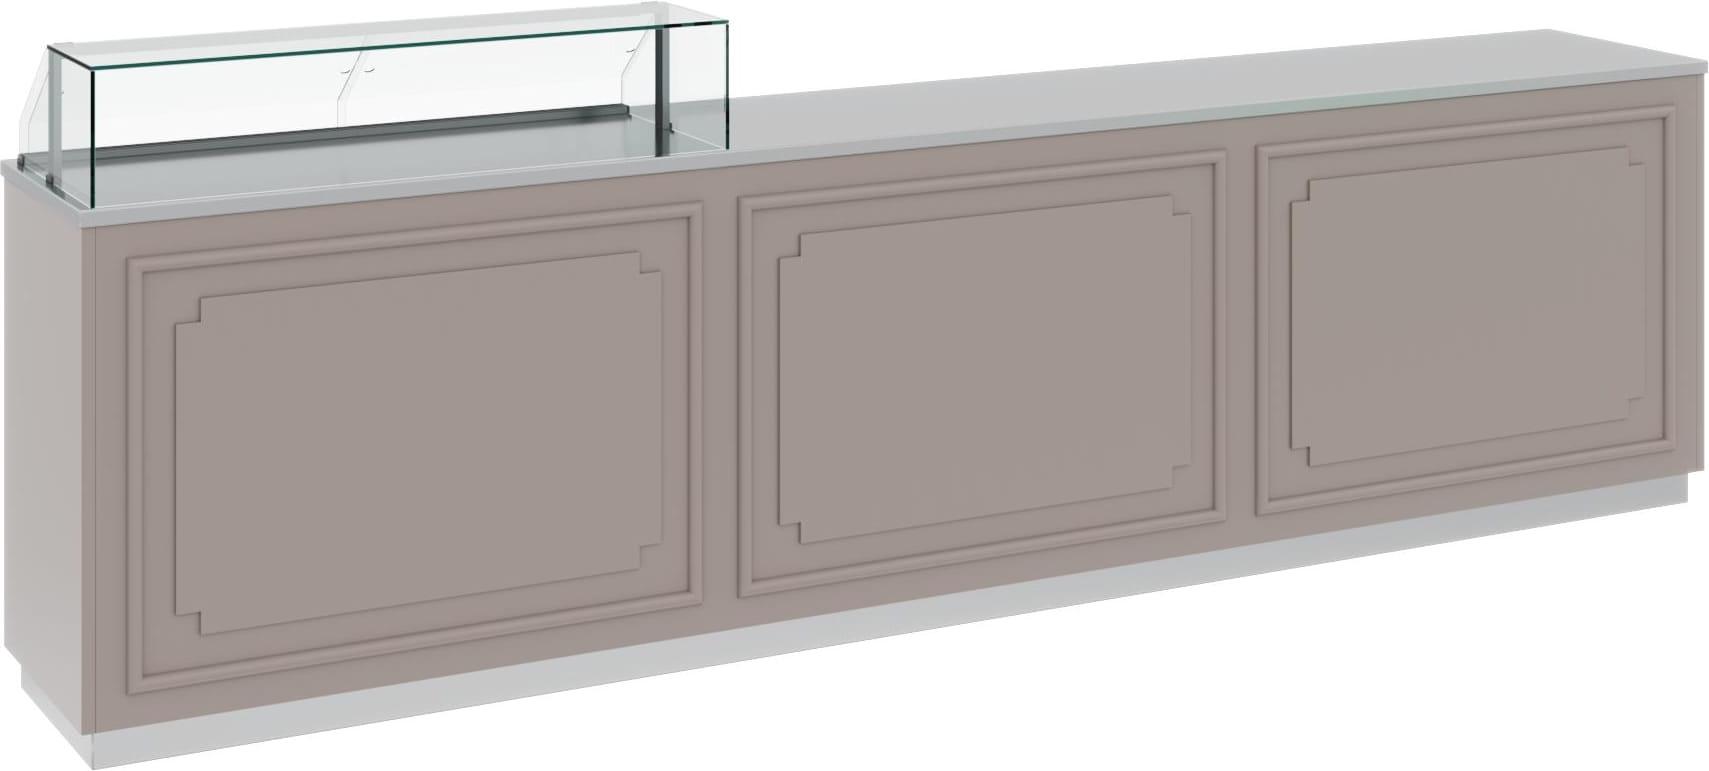 Нейтральная витрина CARBOMA OMI AC40N 1.0-1 - 1